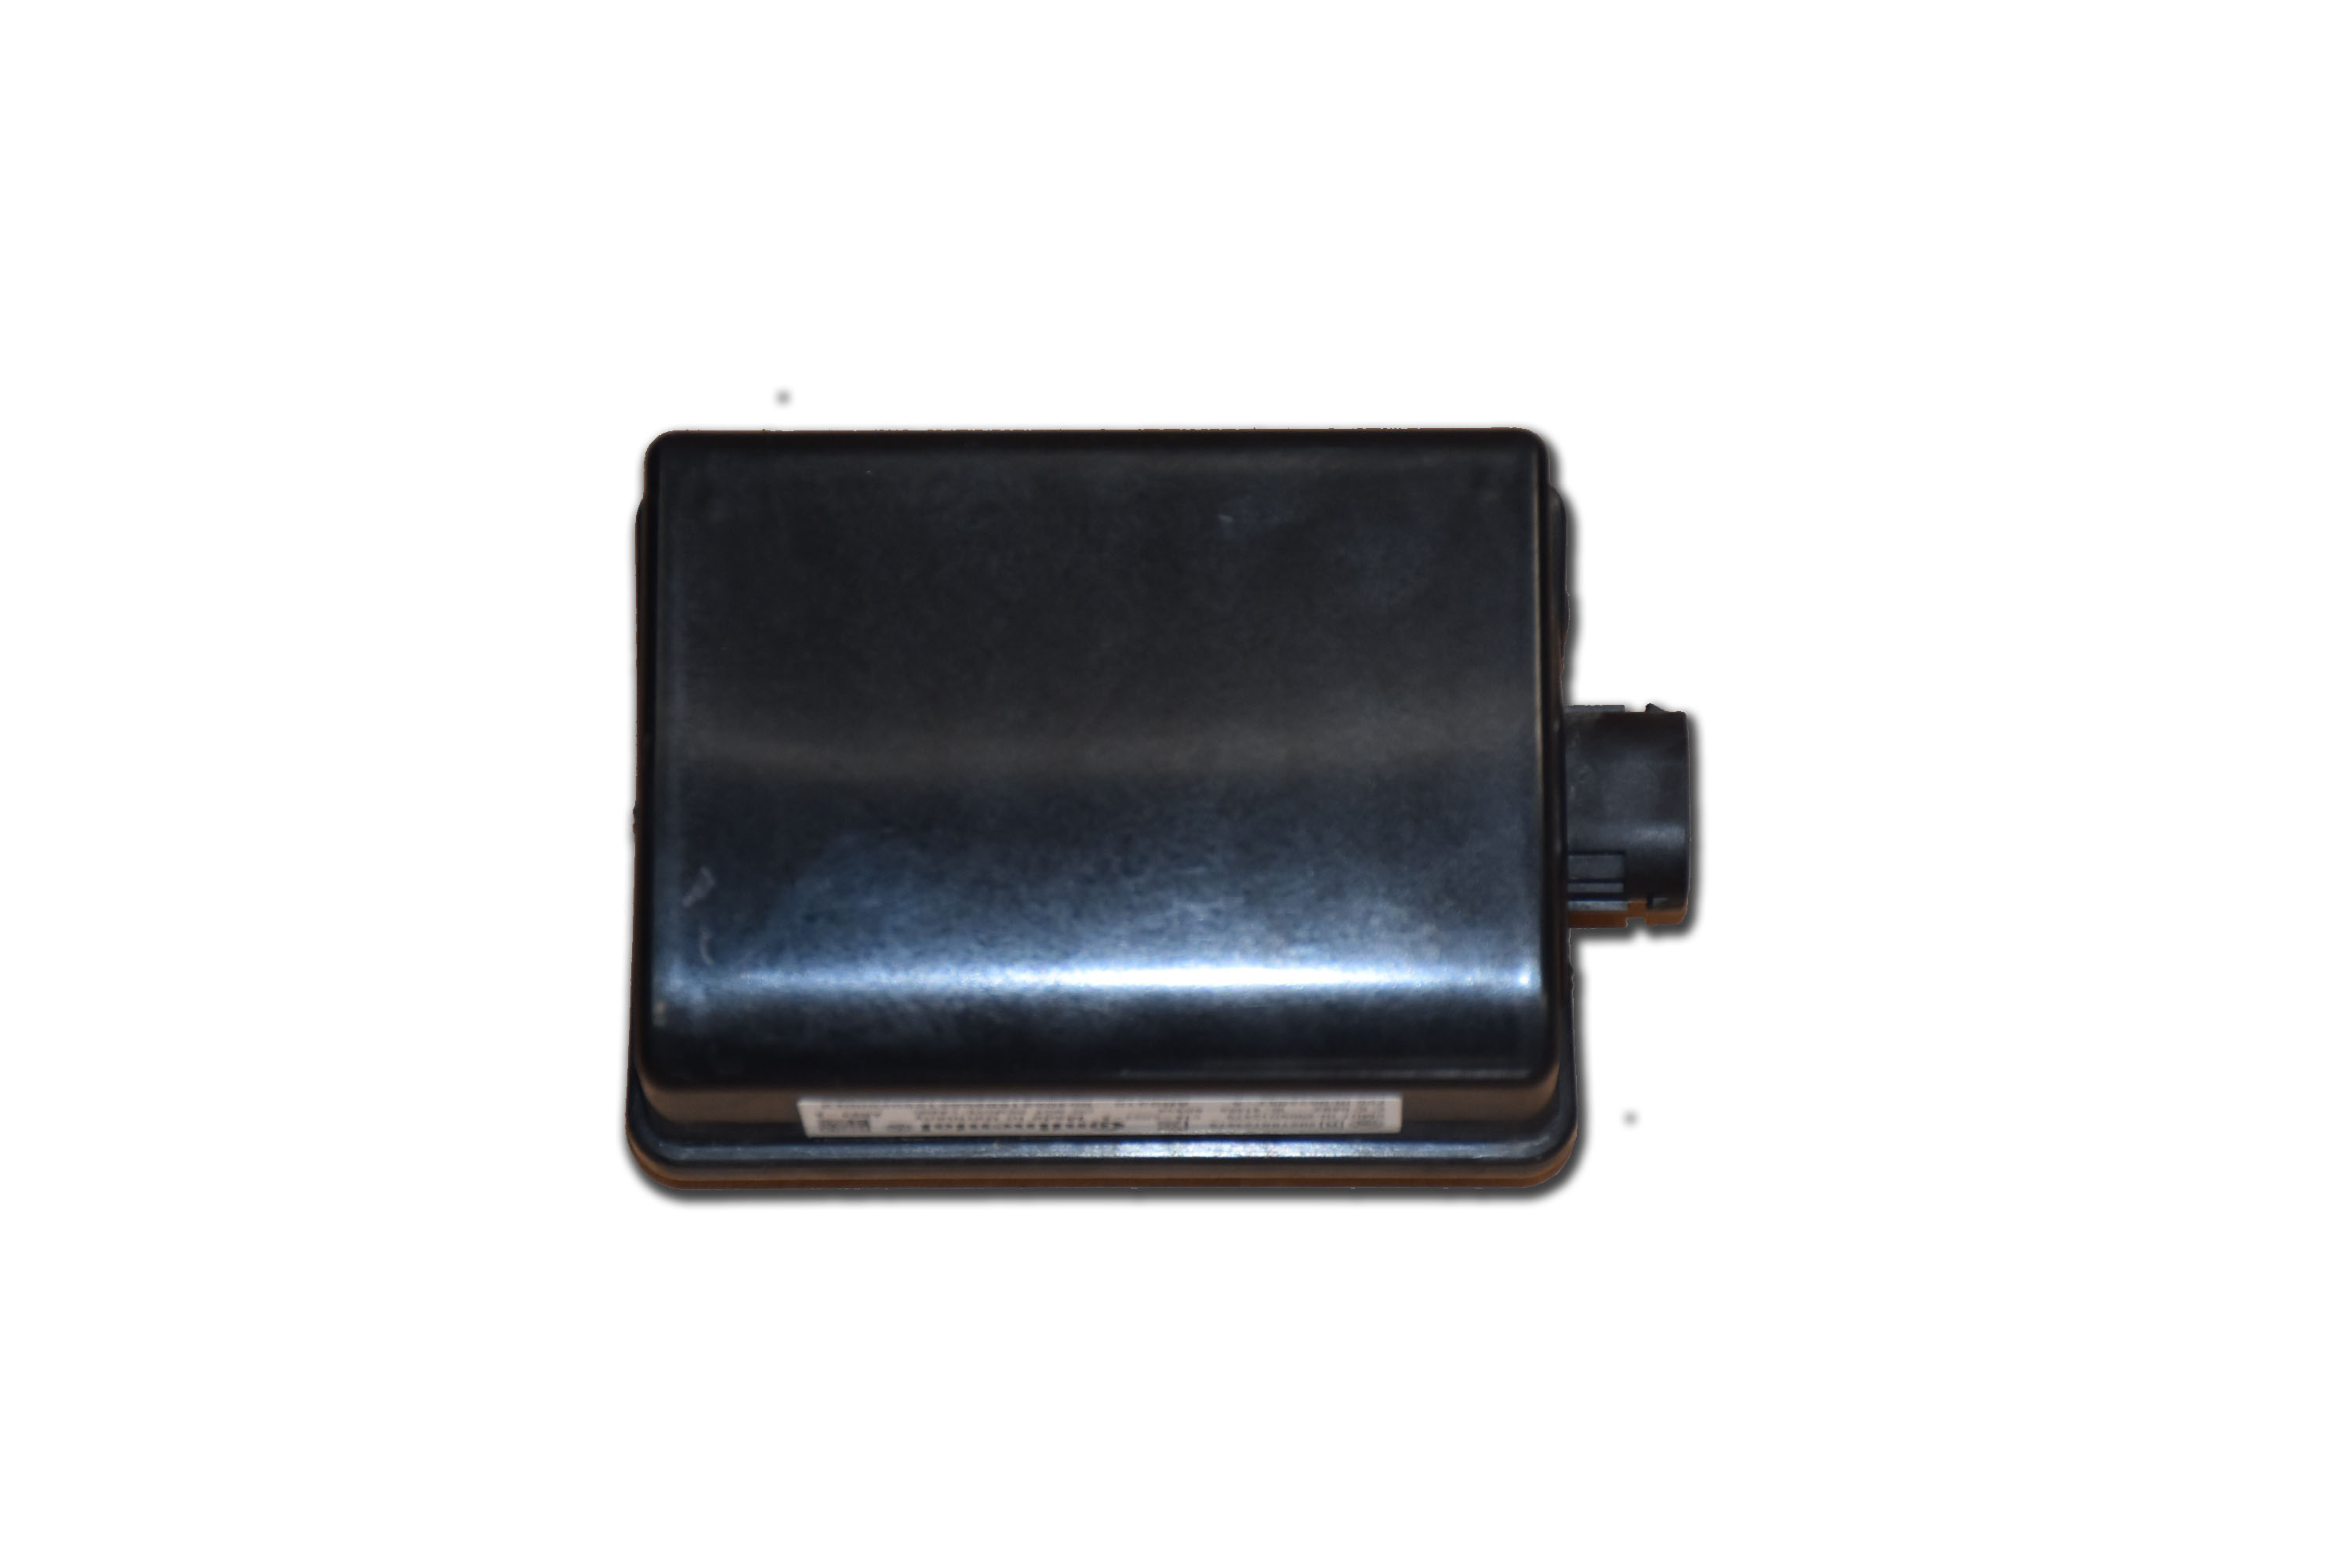 A2129004603 distronic sensor